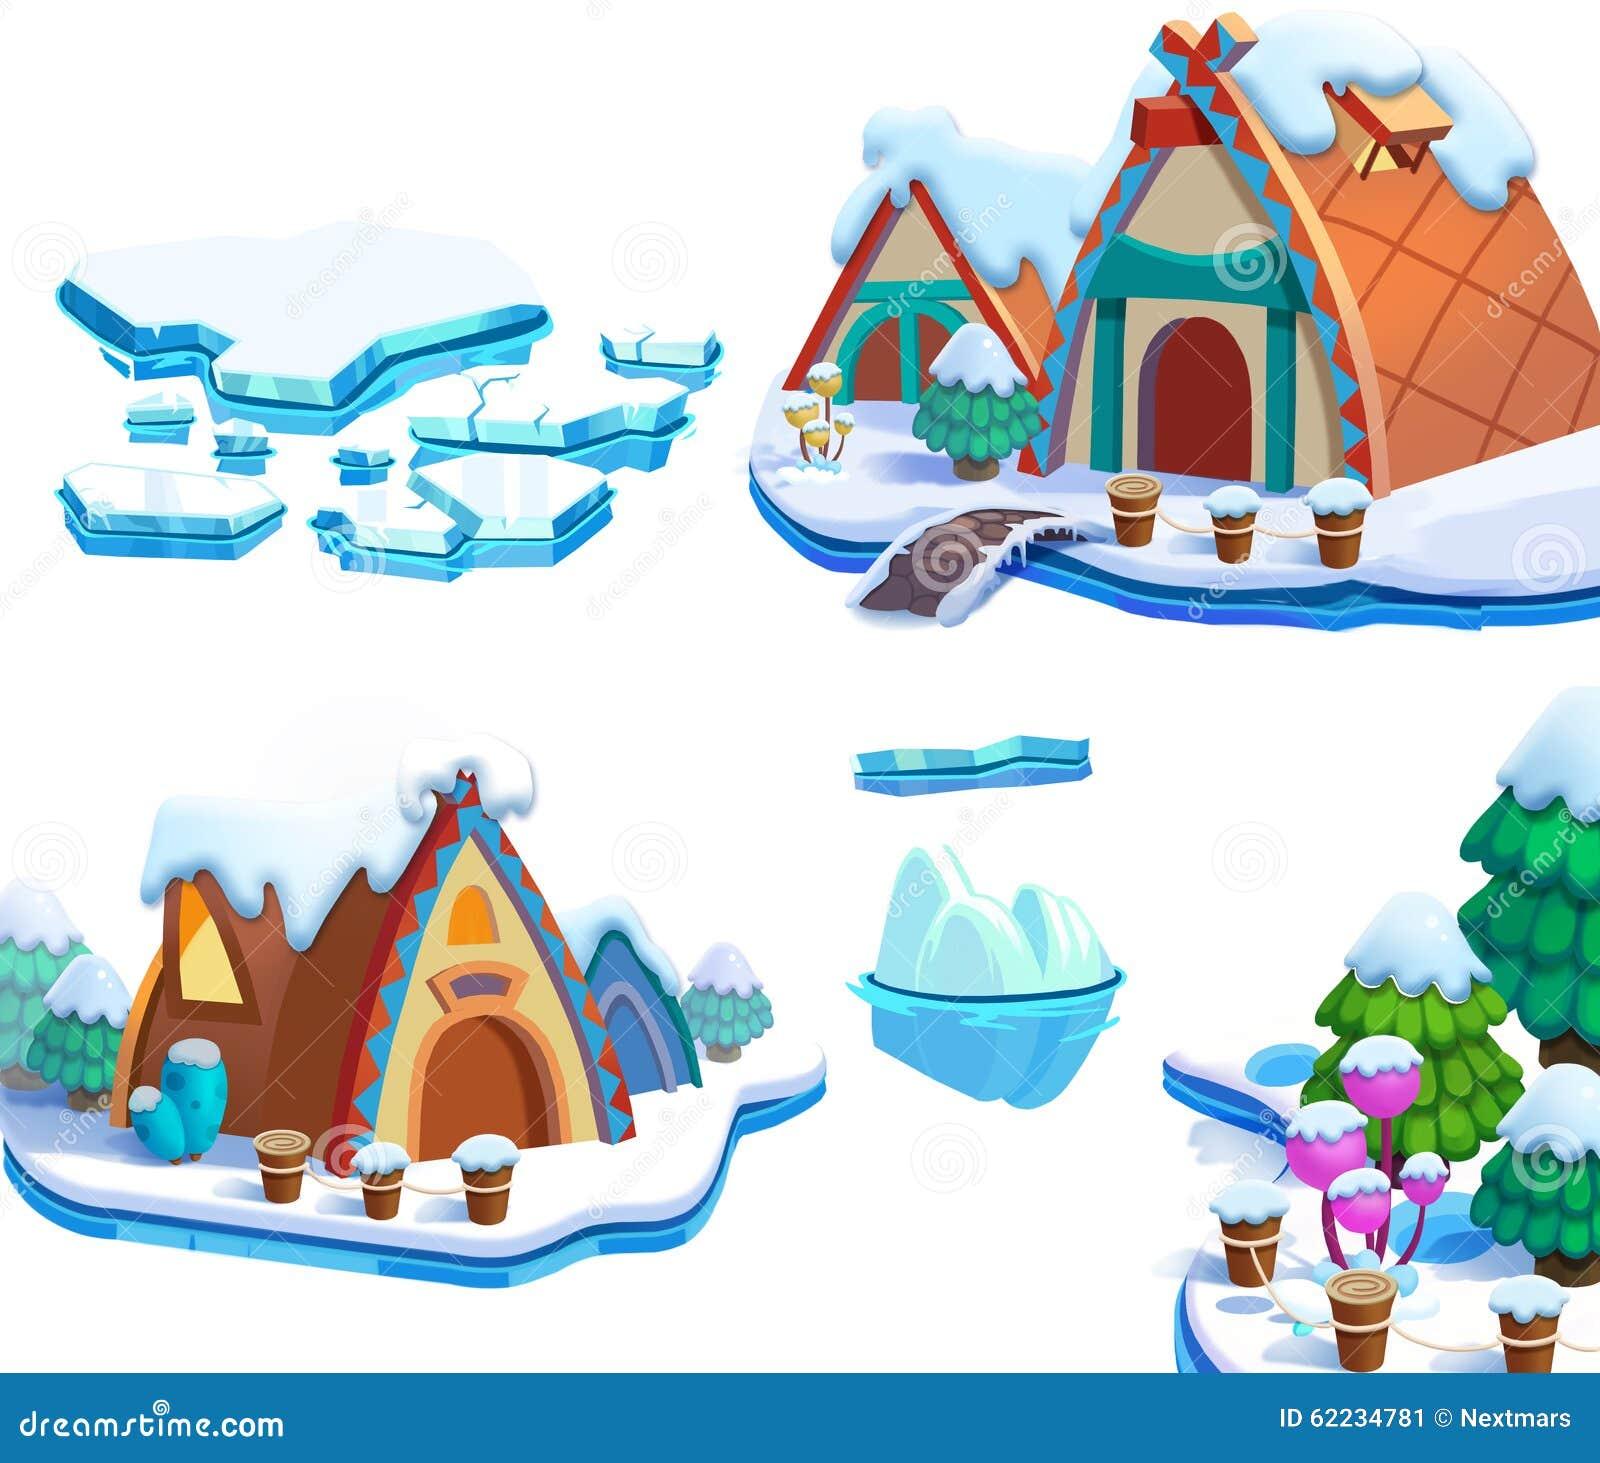 Illustration: Winter Snow Ice World Theme Elements Design